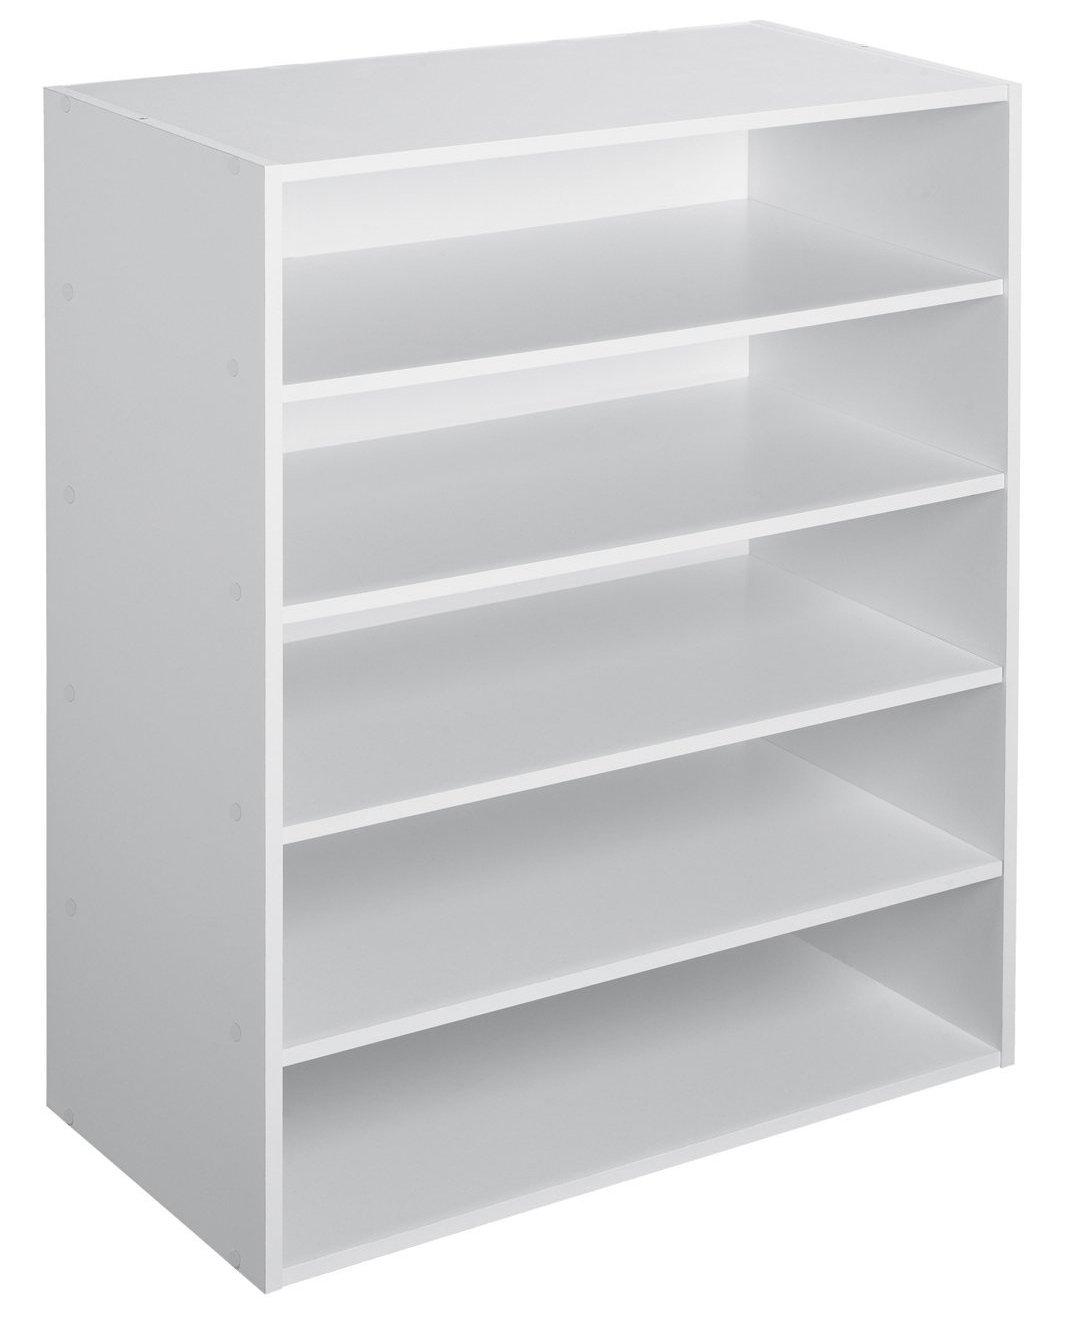 ClosetMaid 1565 Stackable 5-Shelf Organizer, White